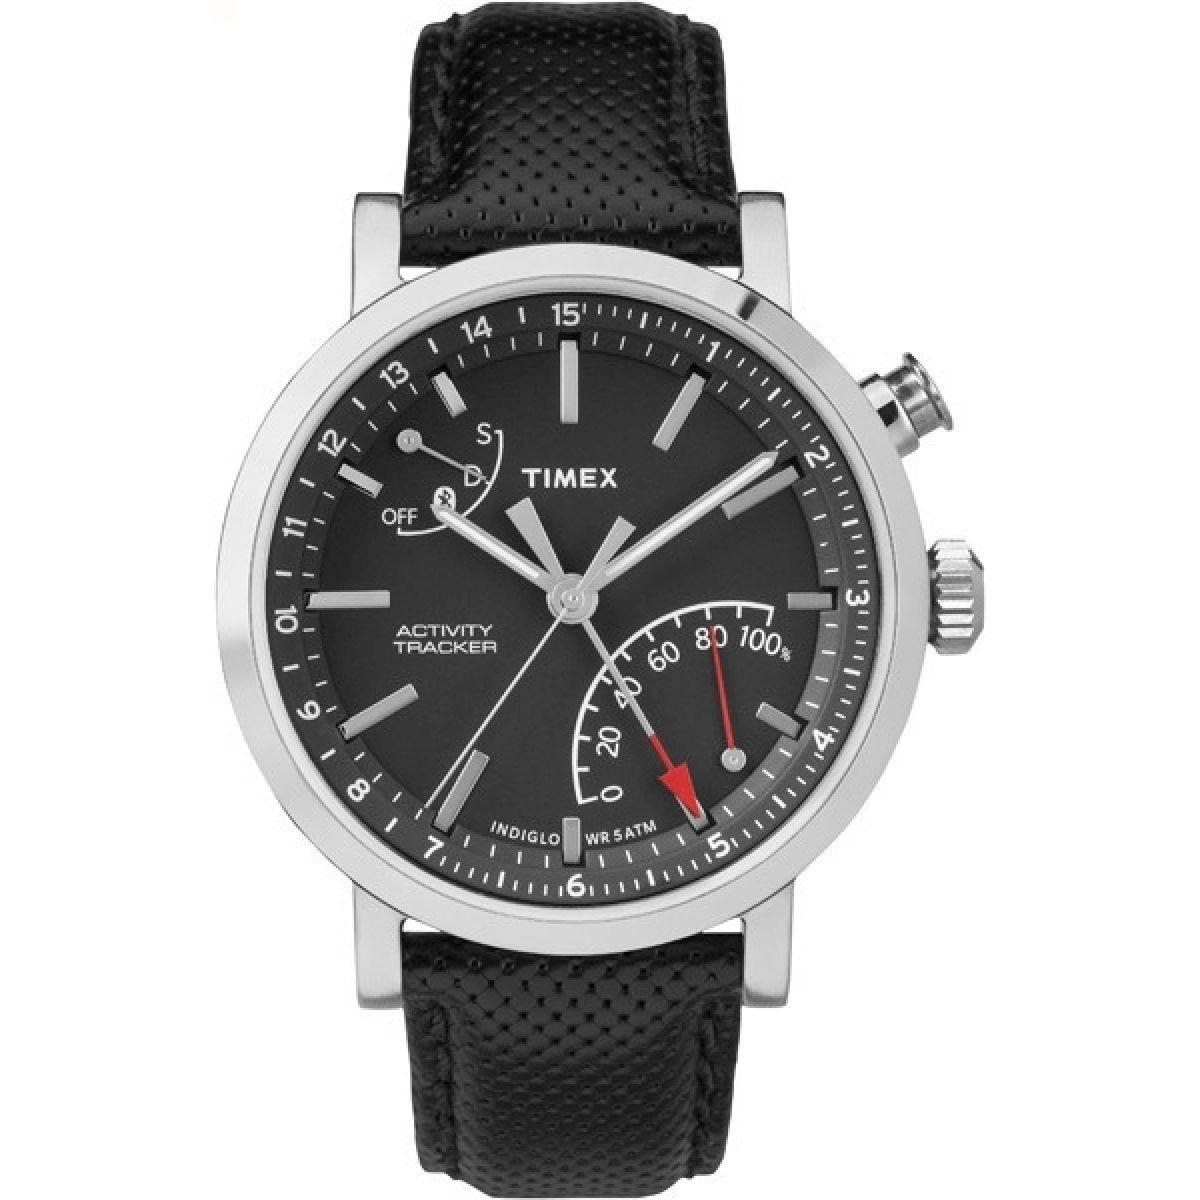 En Hombre Tw2p817002 Reloj 00 Libre Timex Mercado Para 499 iPkXZu